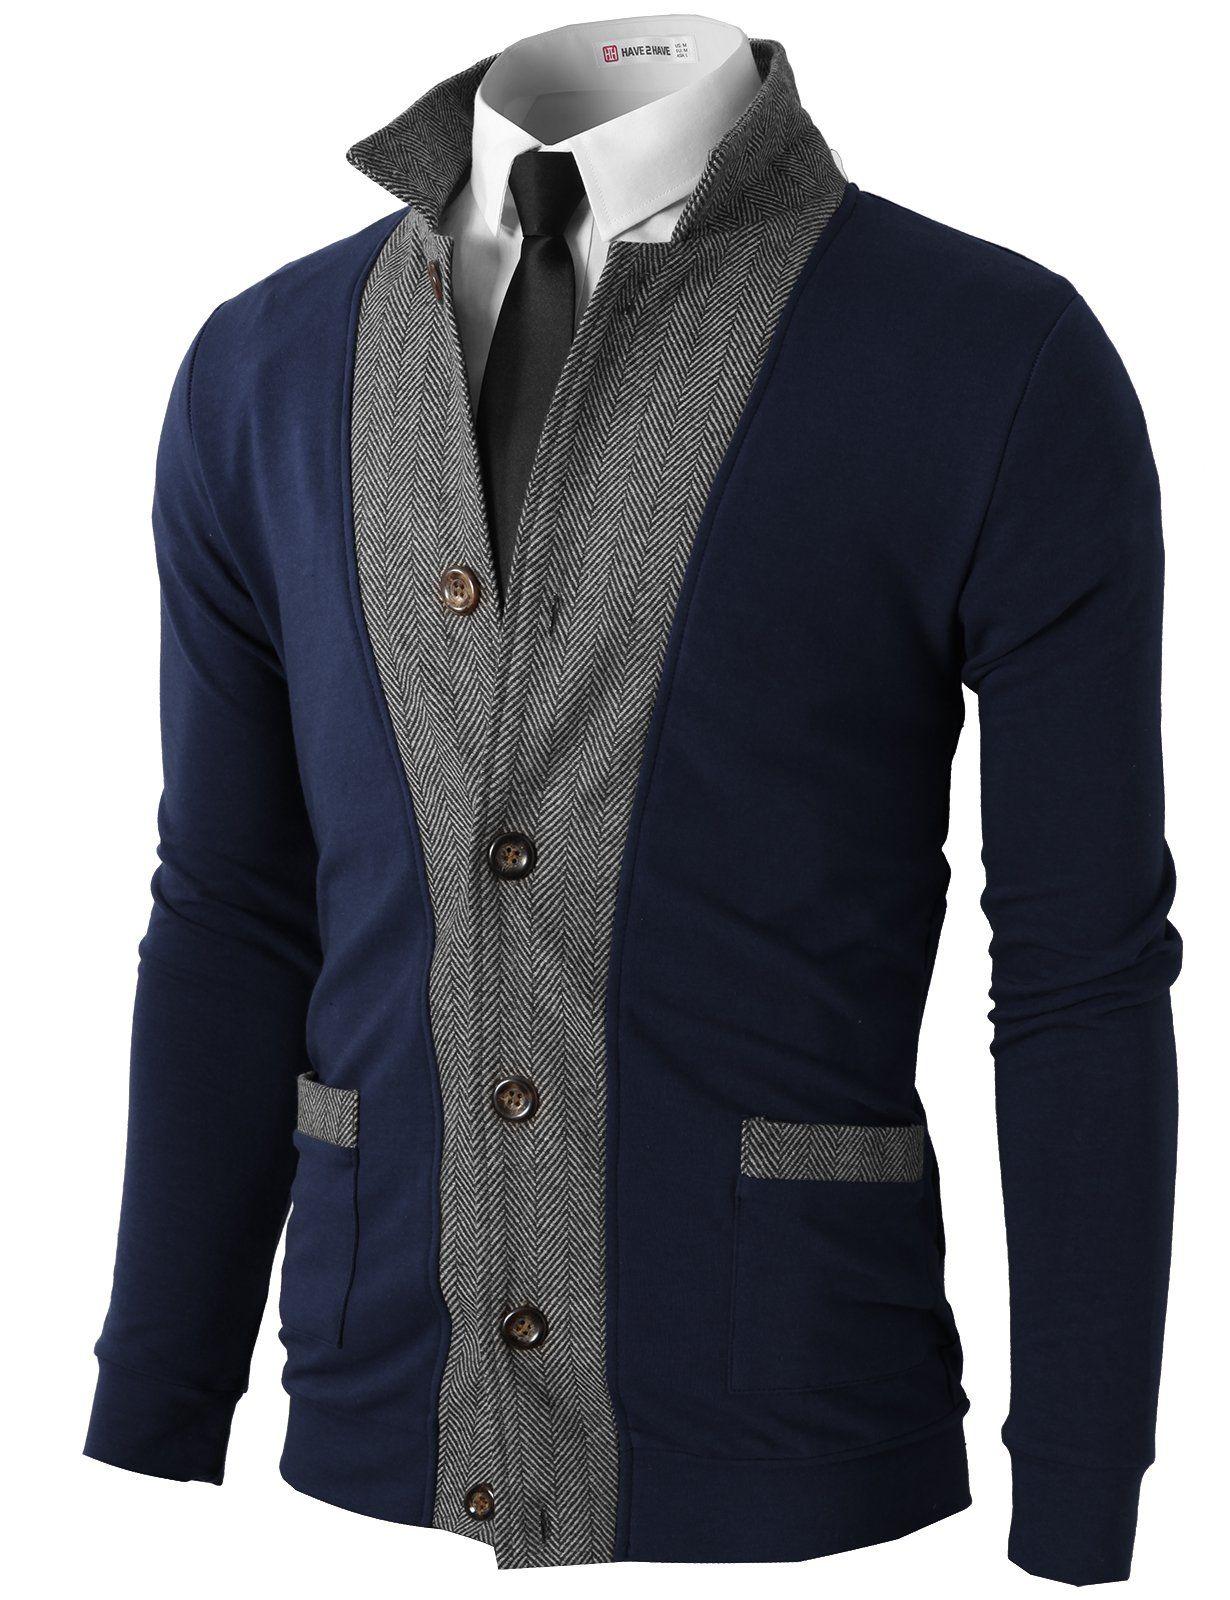 H2H Mens Two-tone Herringbone Jacket Cardigans at Amazon Men's ...